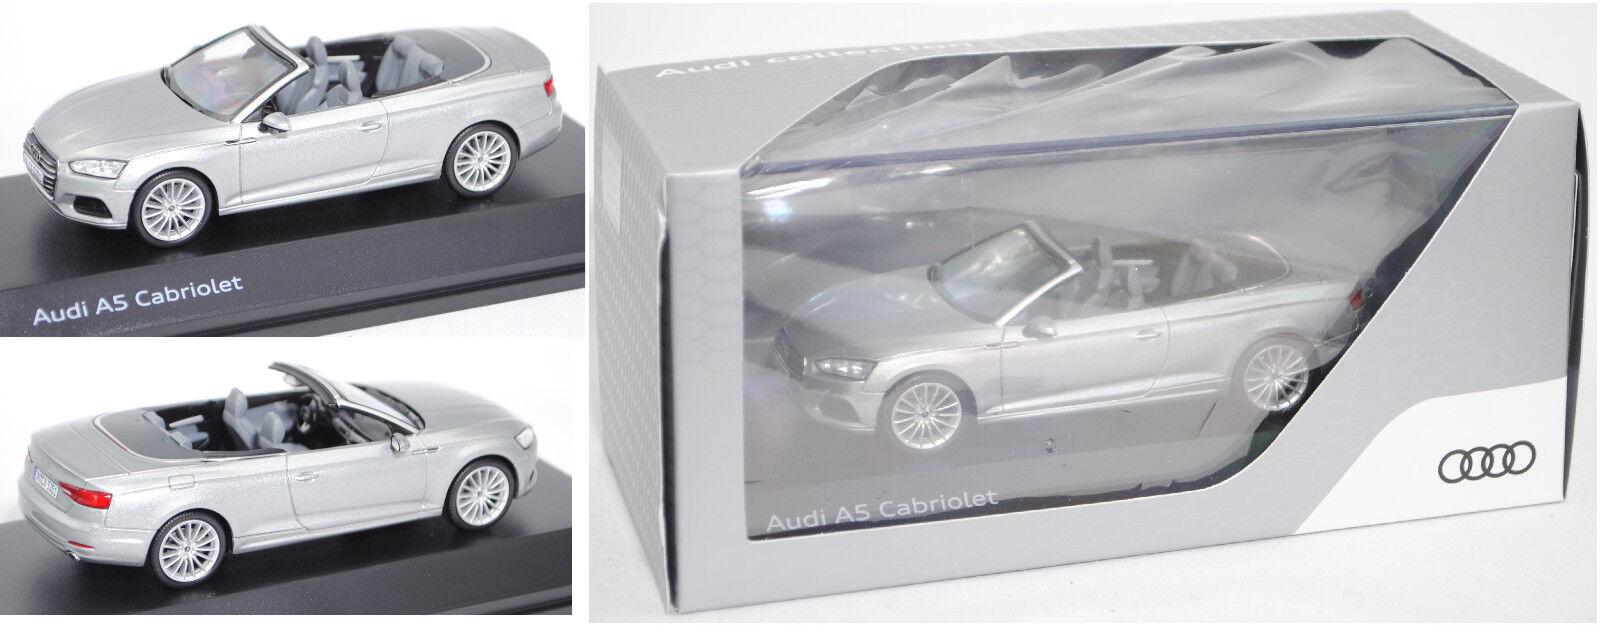 Minimax 5011705331 Audi A5 Cabriolet, florettsilver, 1 43, Werbeschachtel